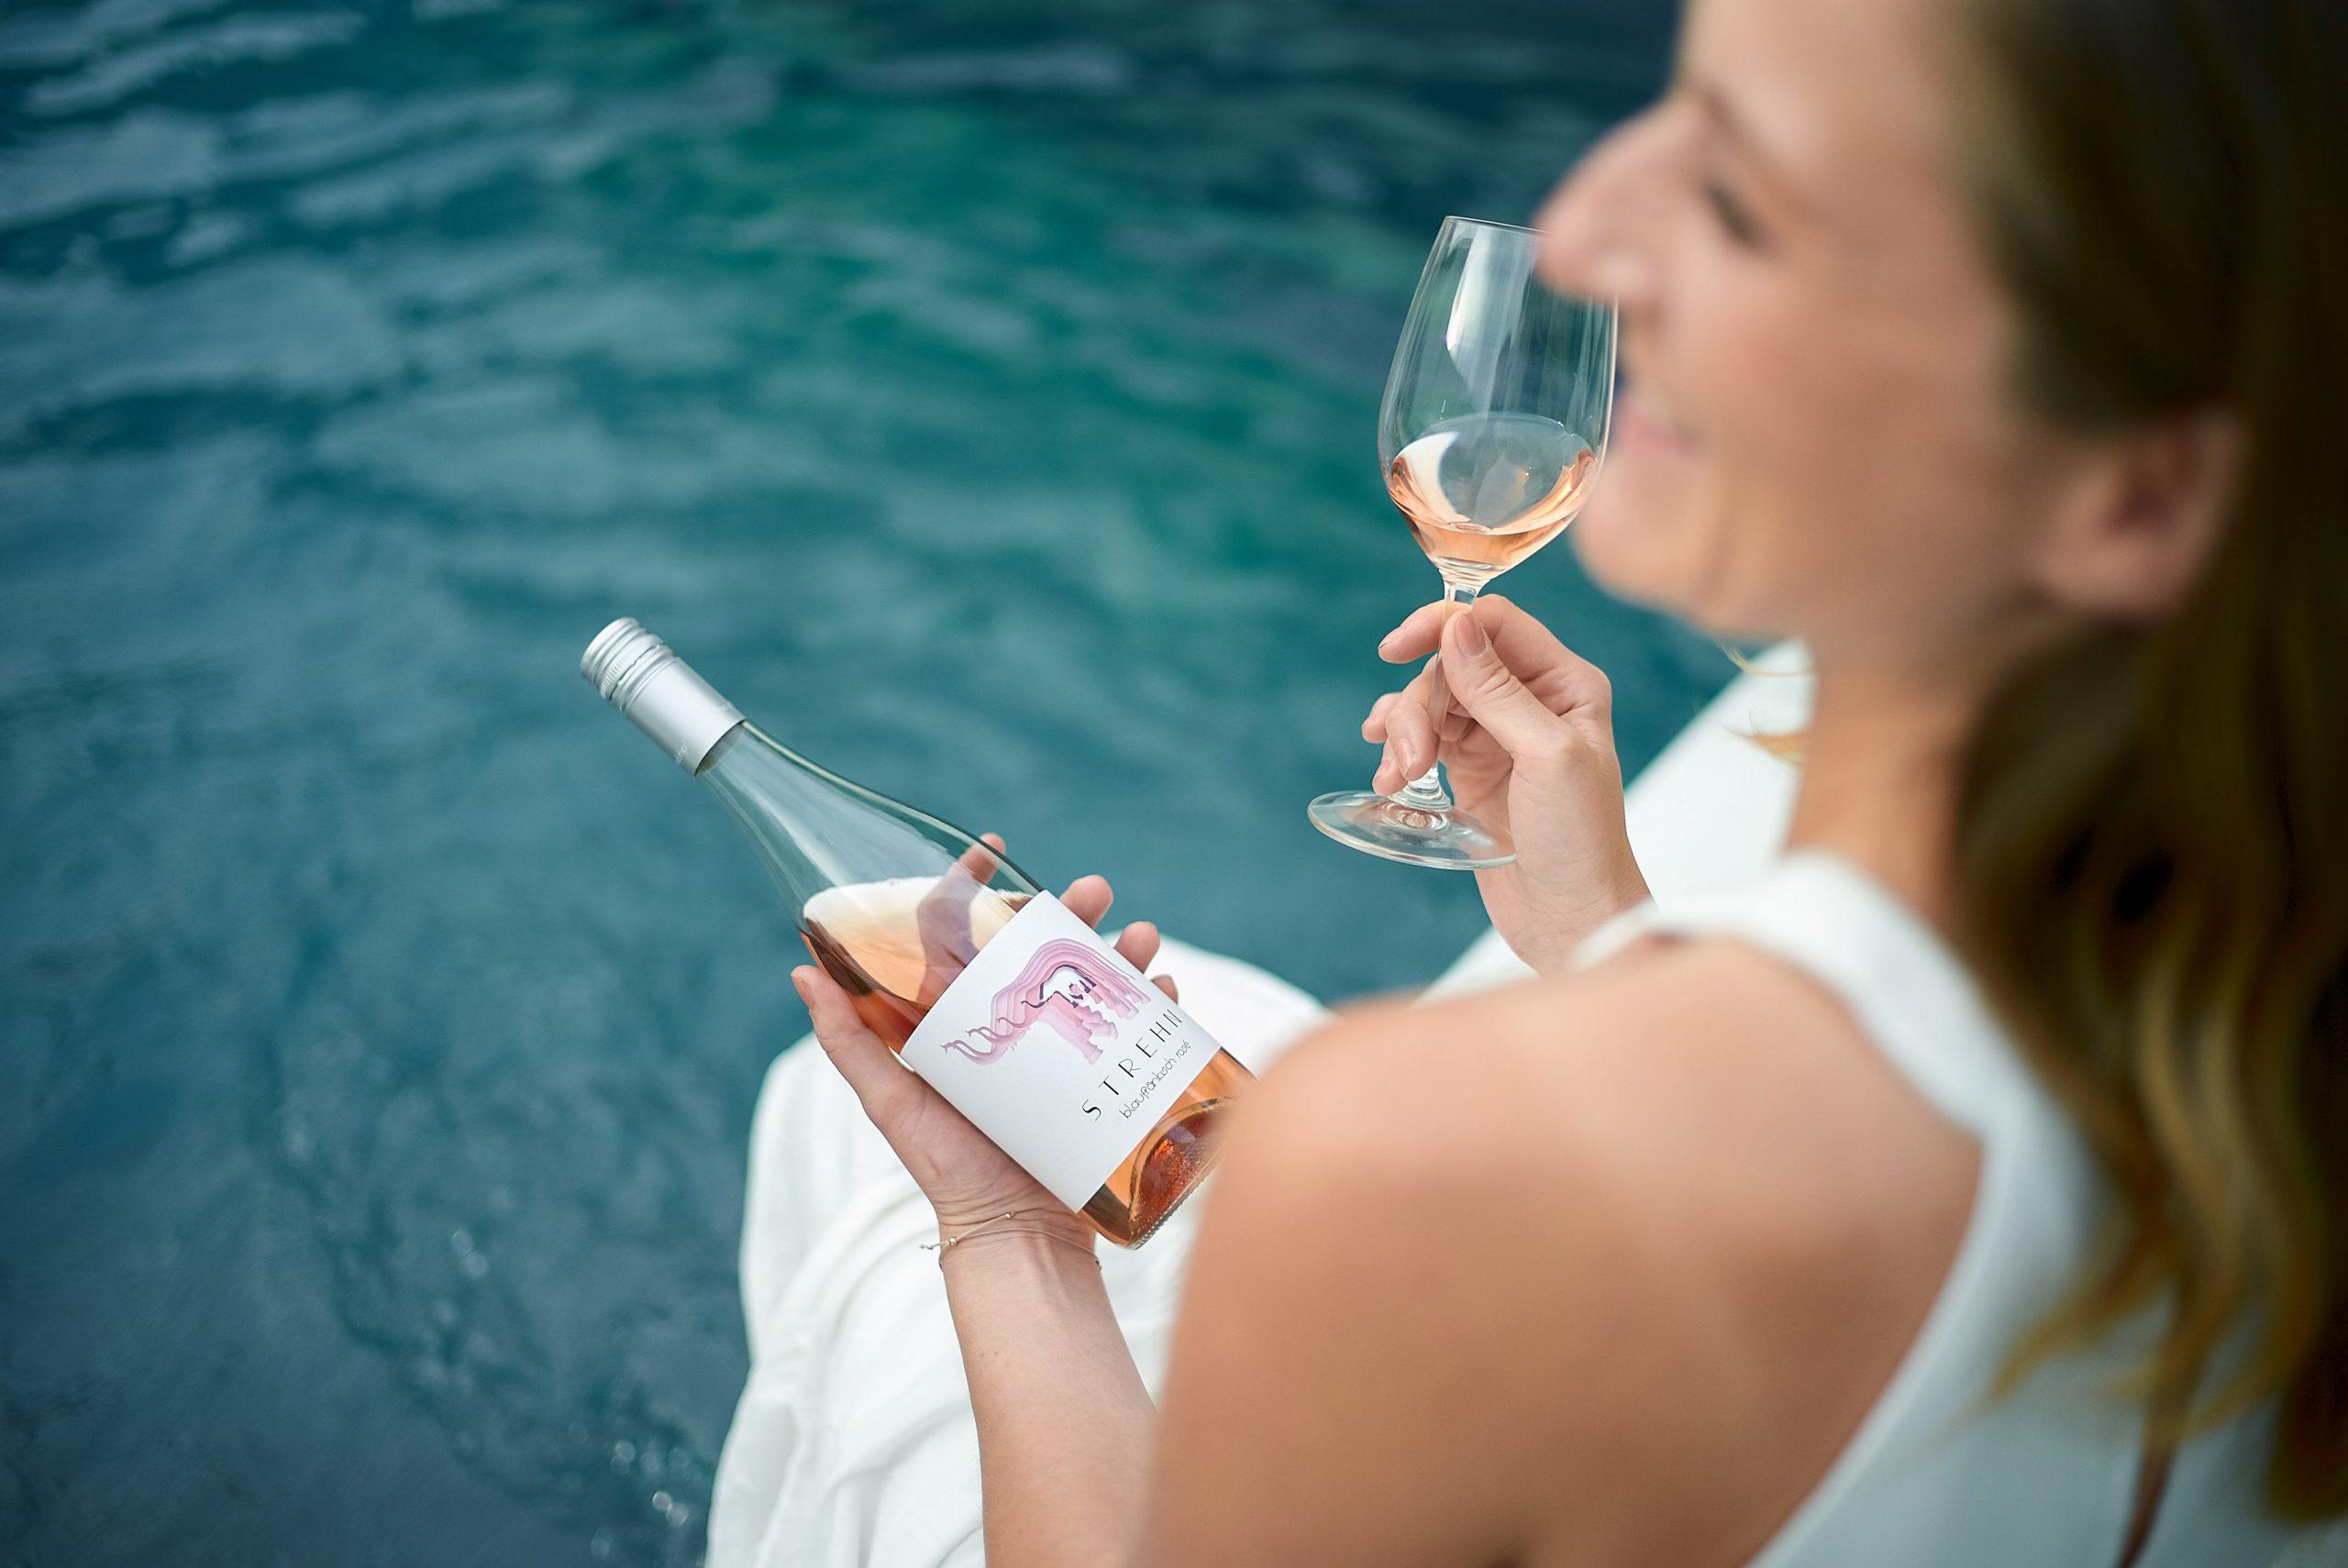 Flasche Rose-Wein_Erfrischung am Pool